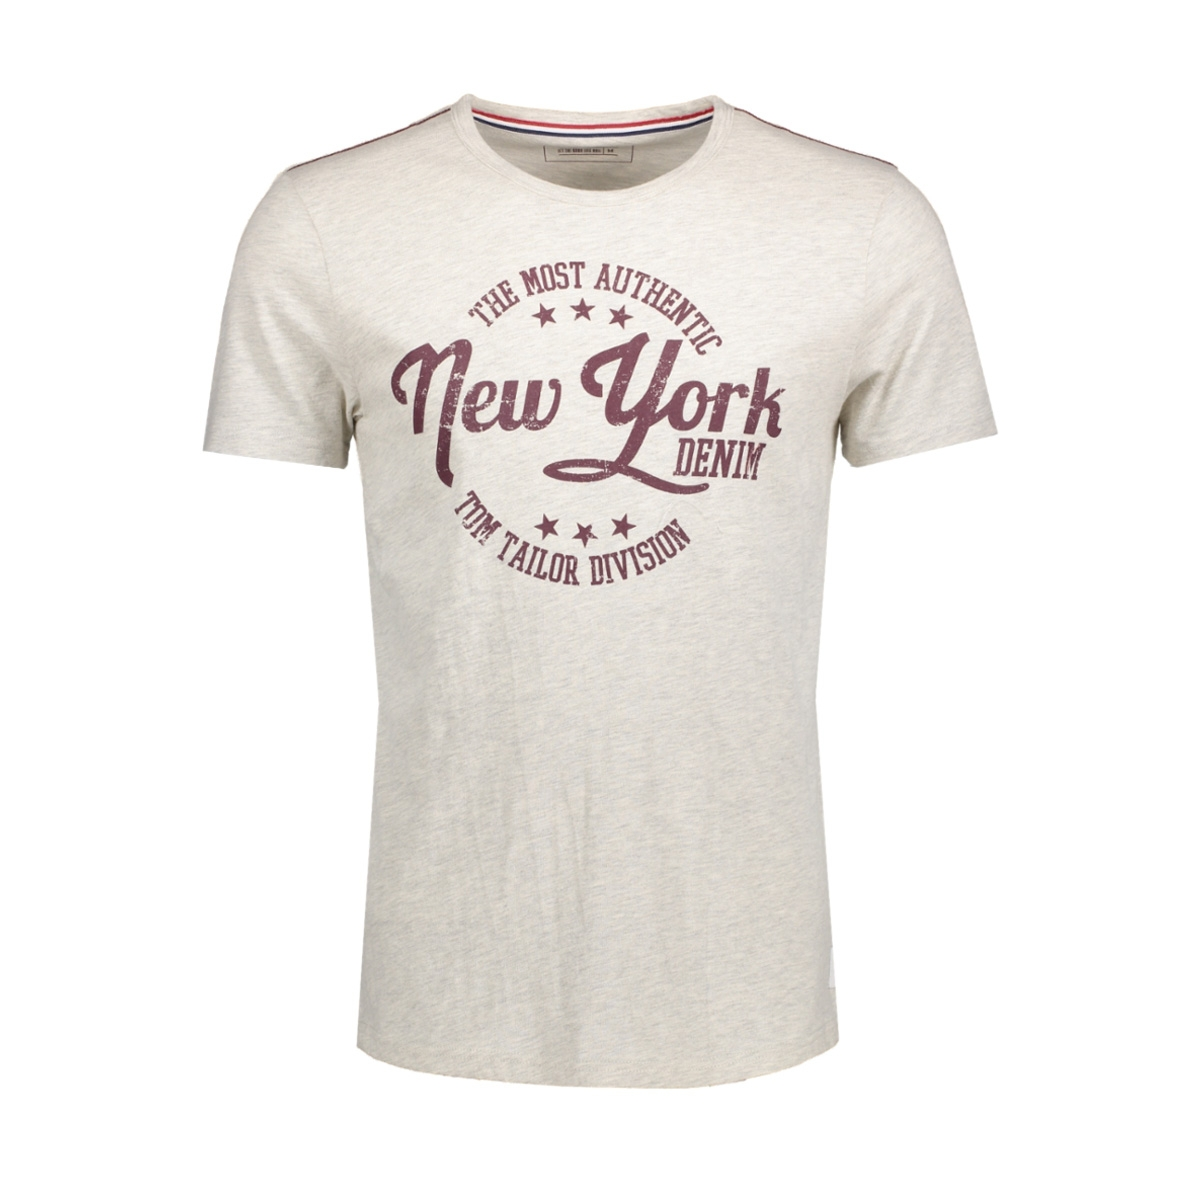 1038245.09.12 tom tailor t-shirt 2608